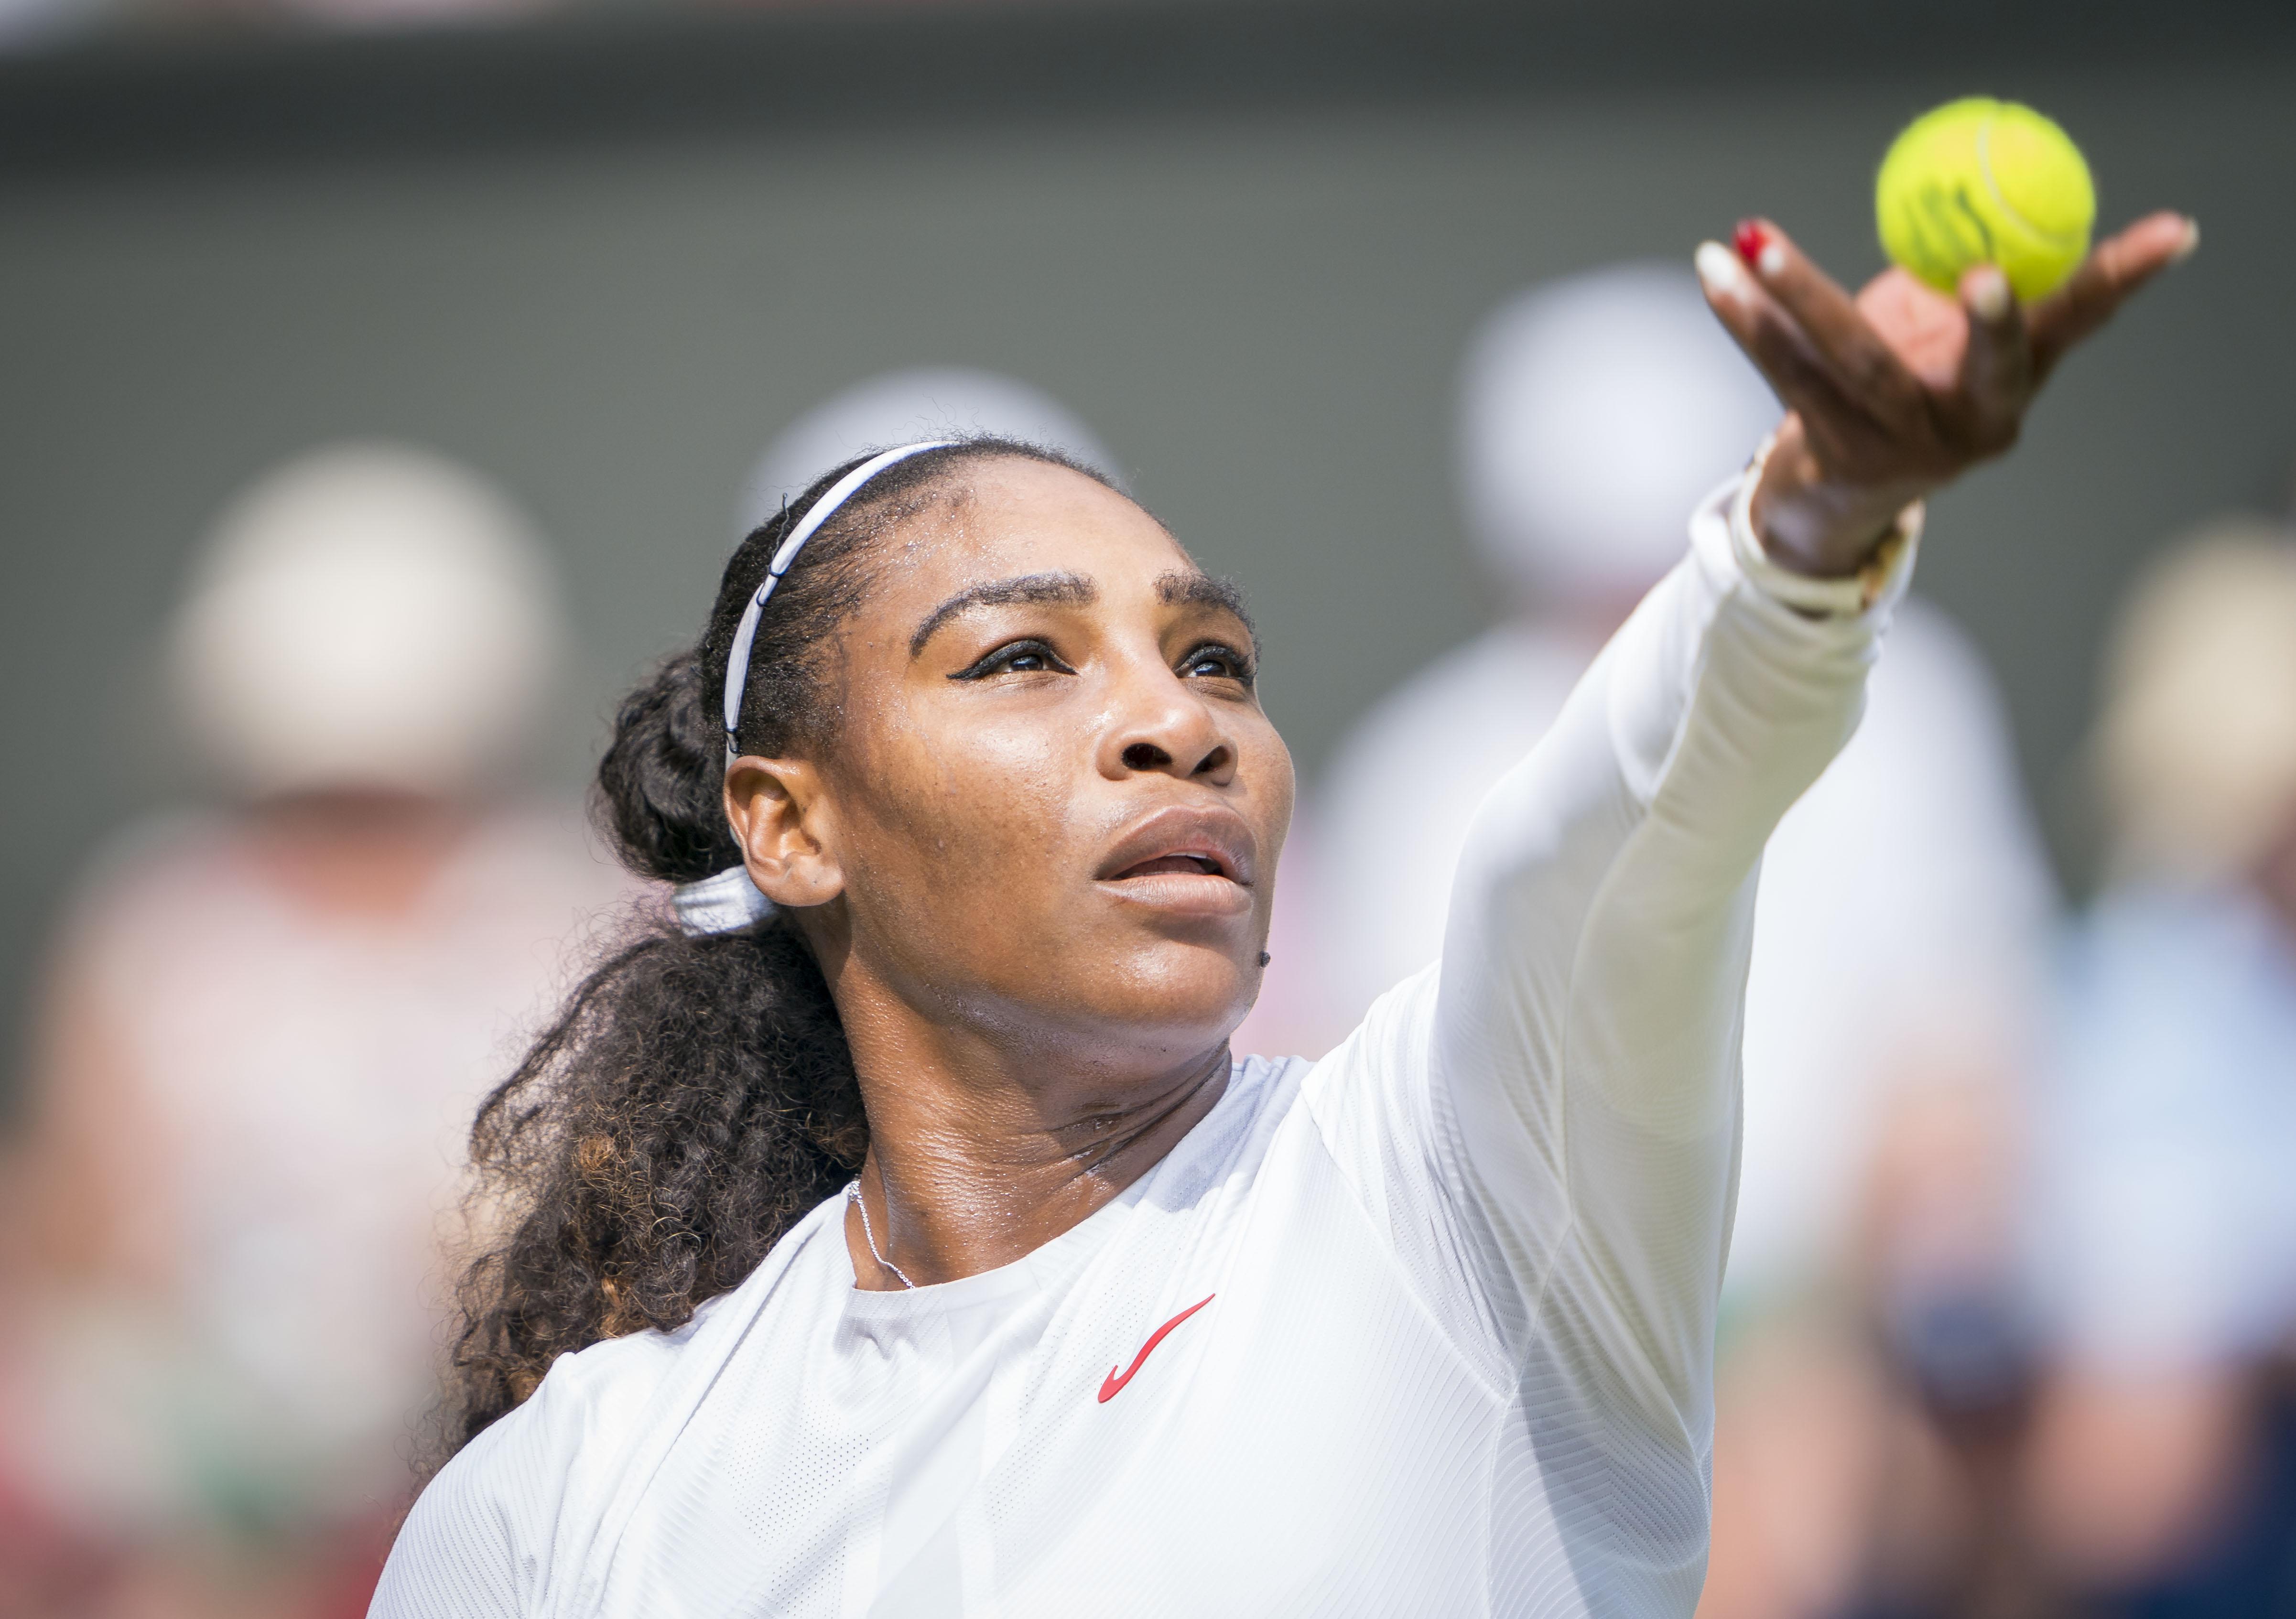 Serena Wimbledon 2018